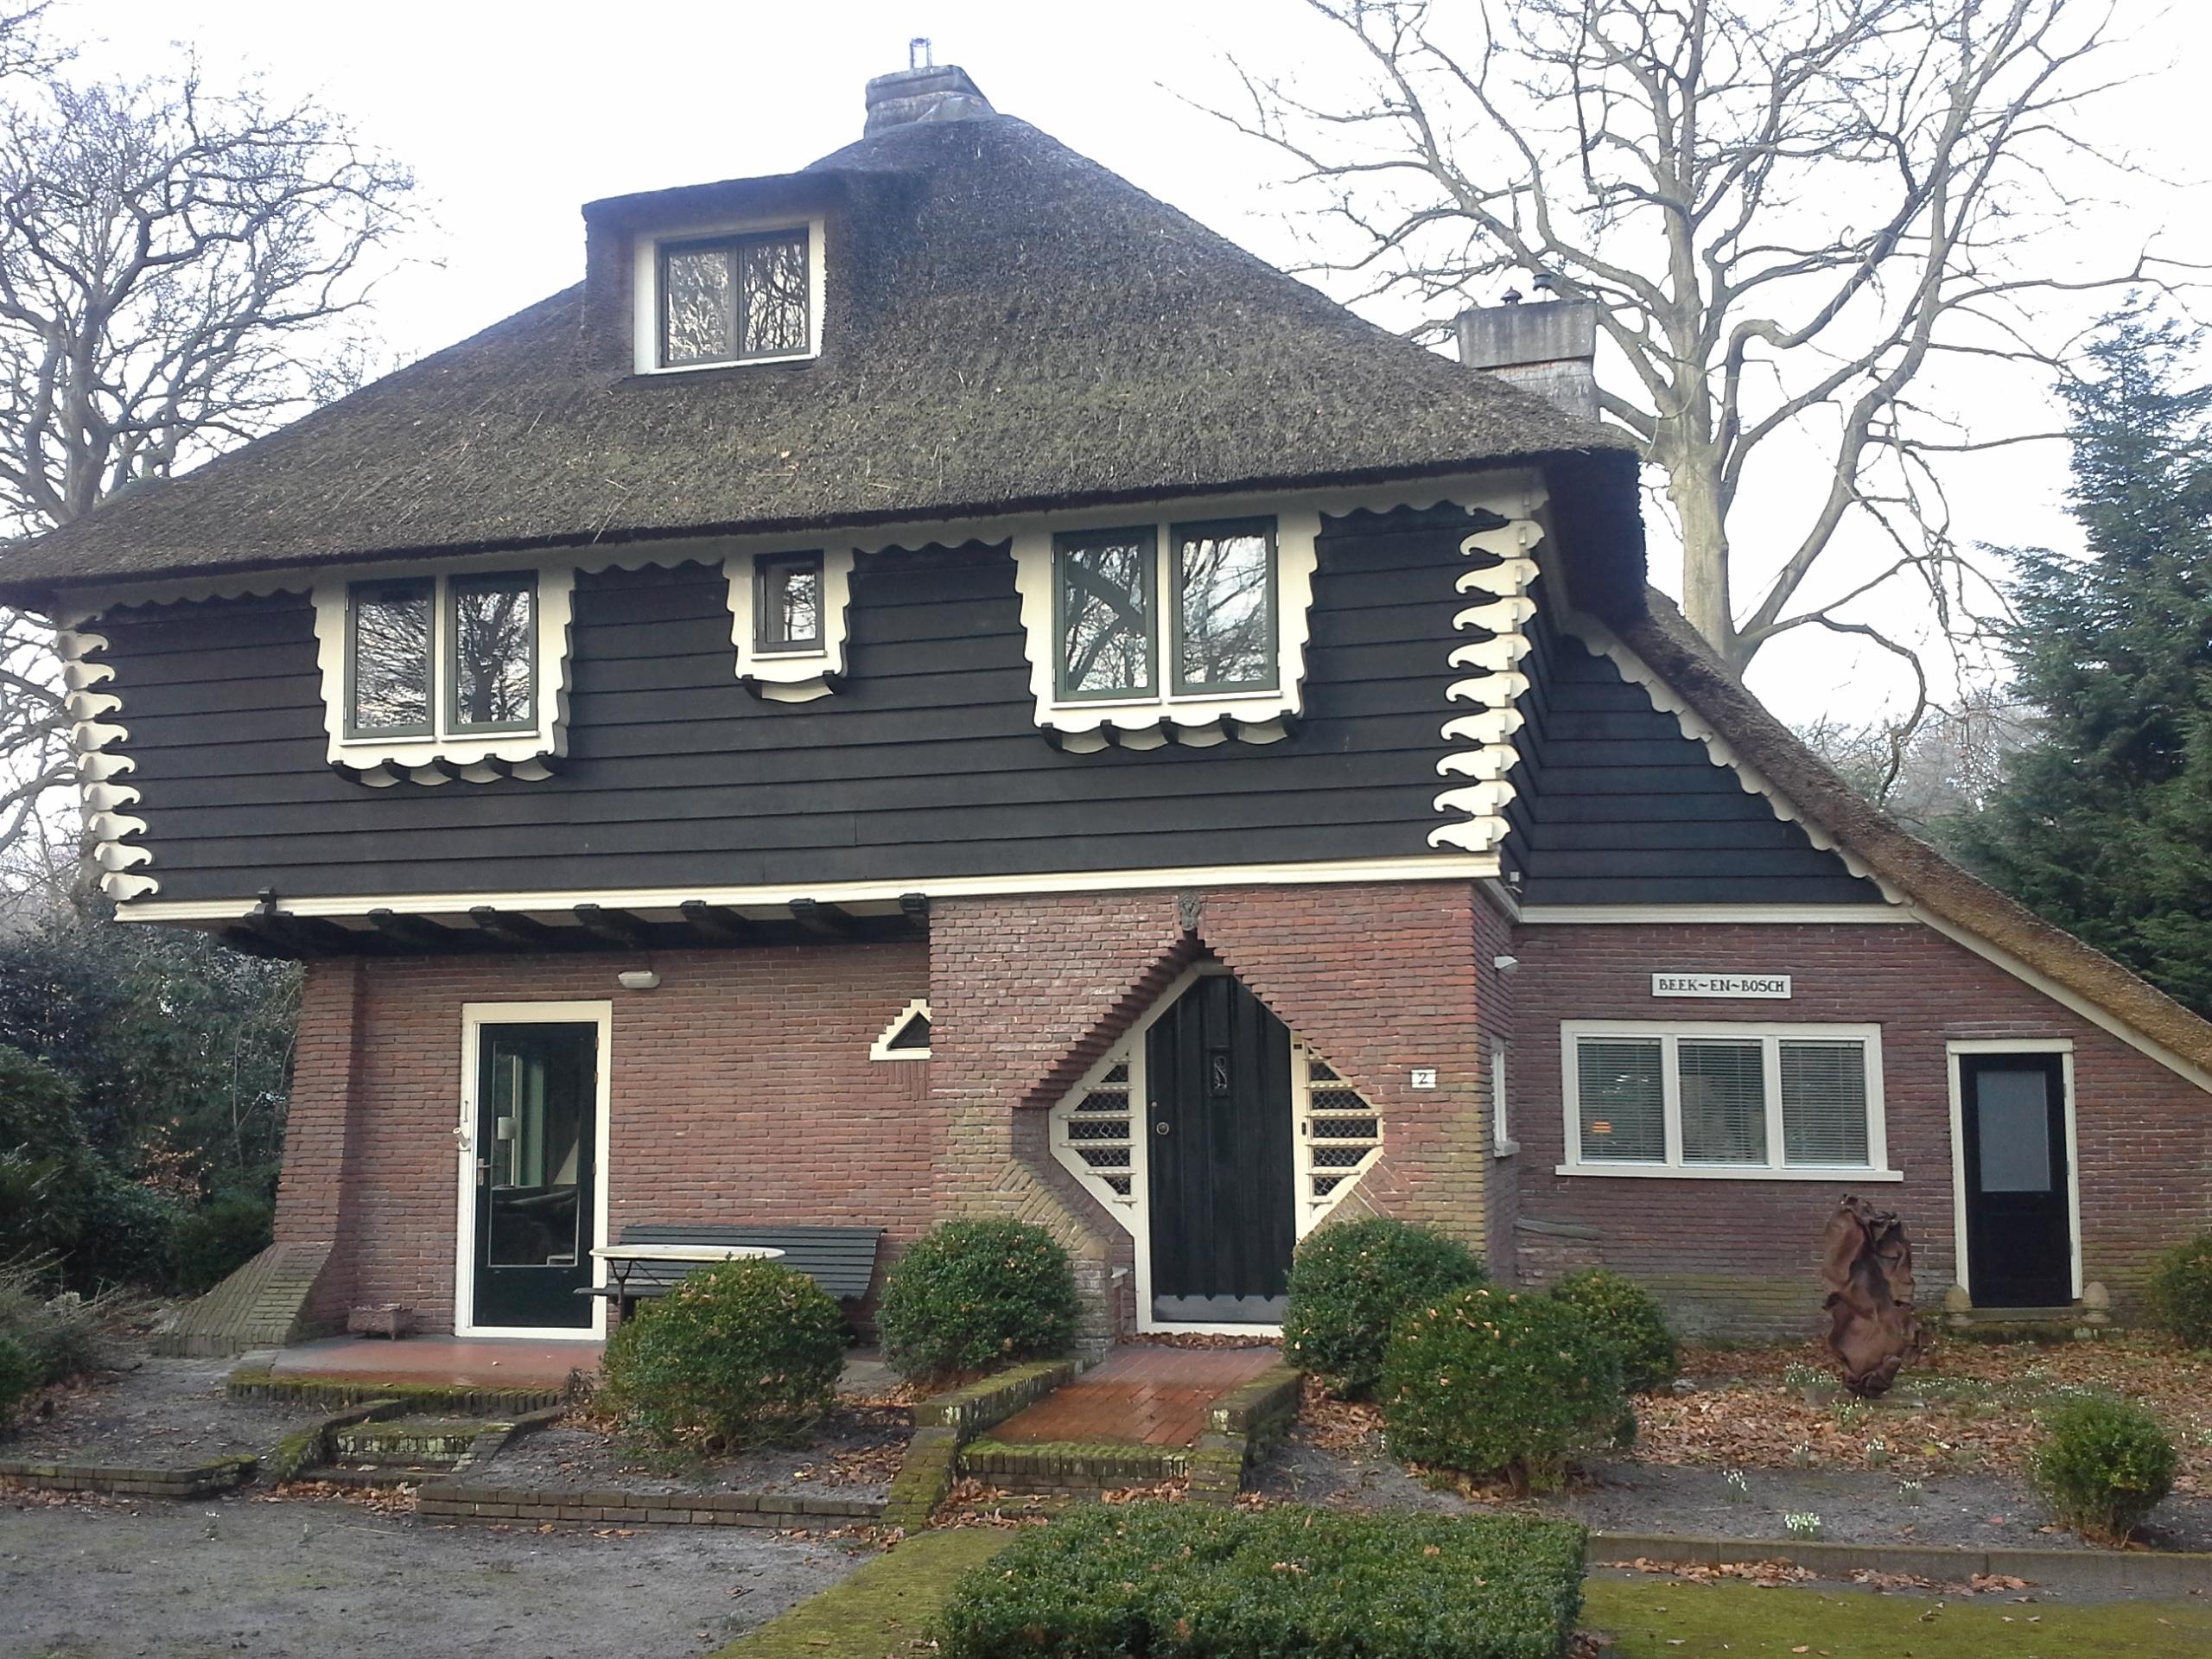 Huis Amsterdamse School Bergen